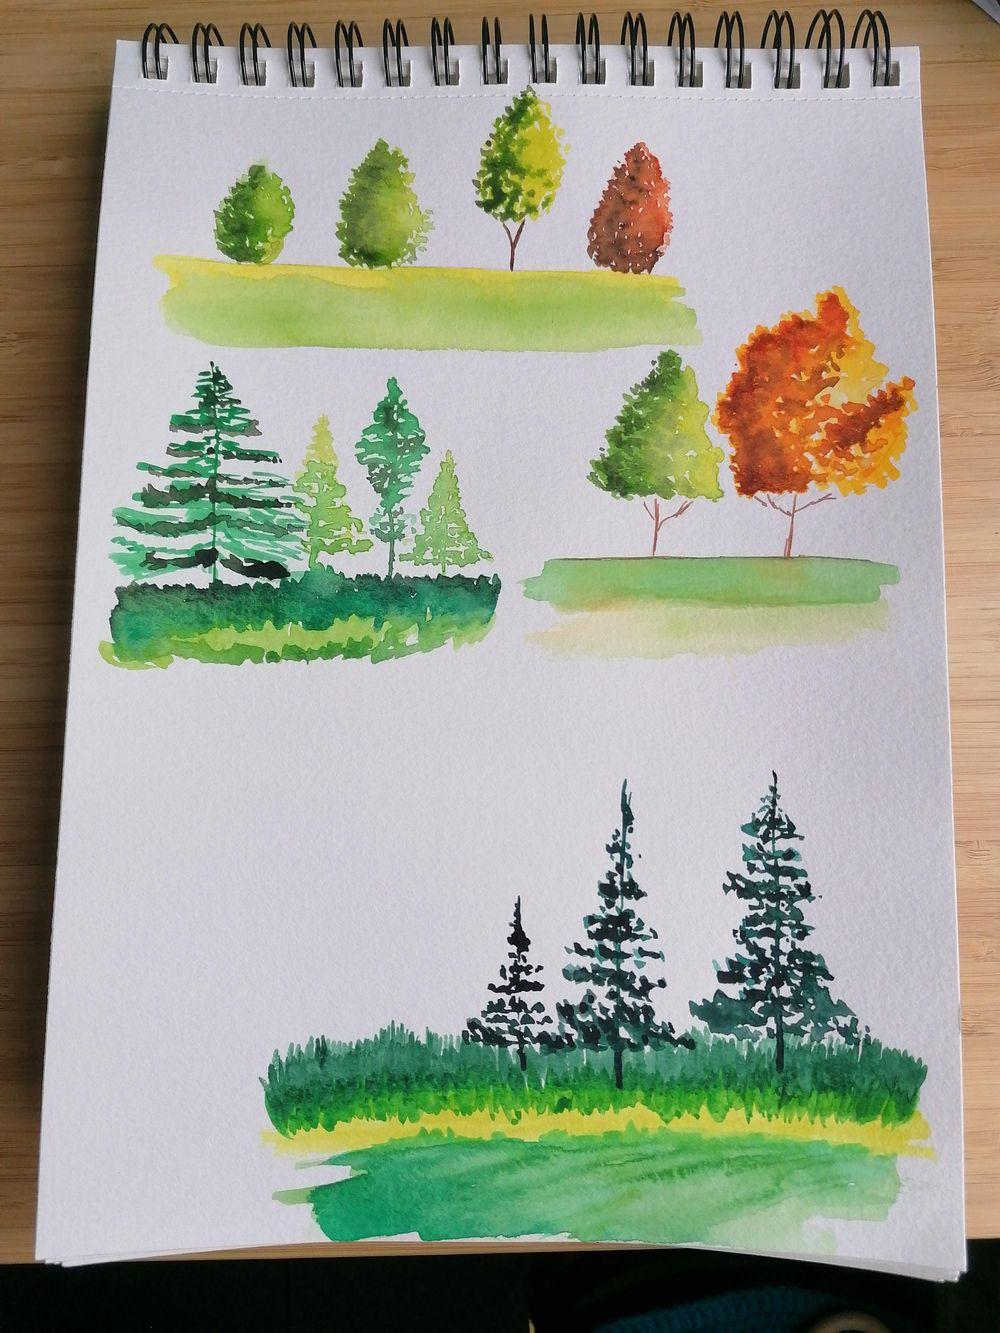 Watercolor landscape - image 2 - student project